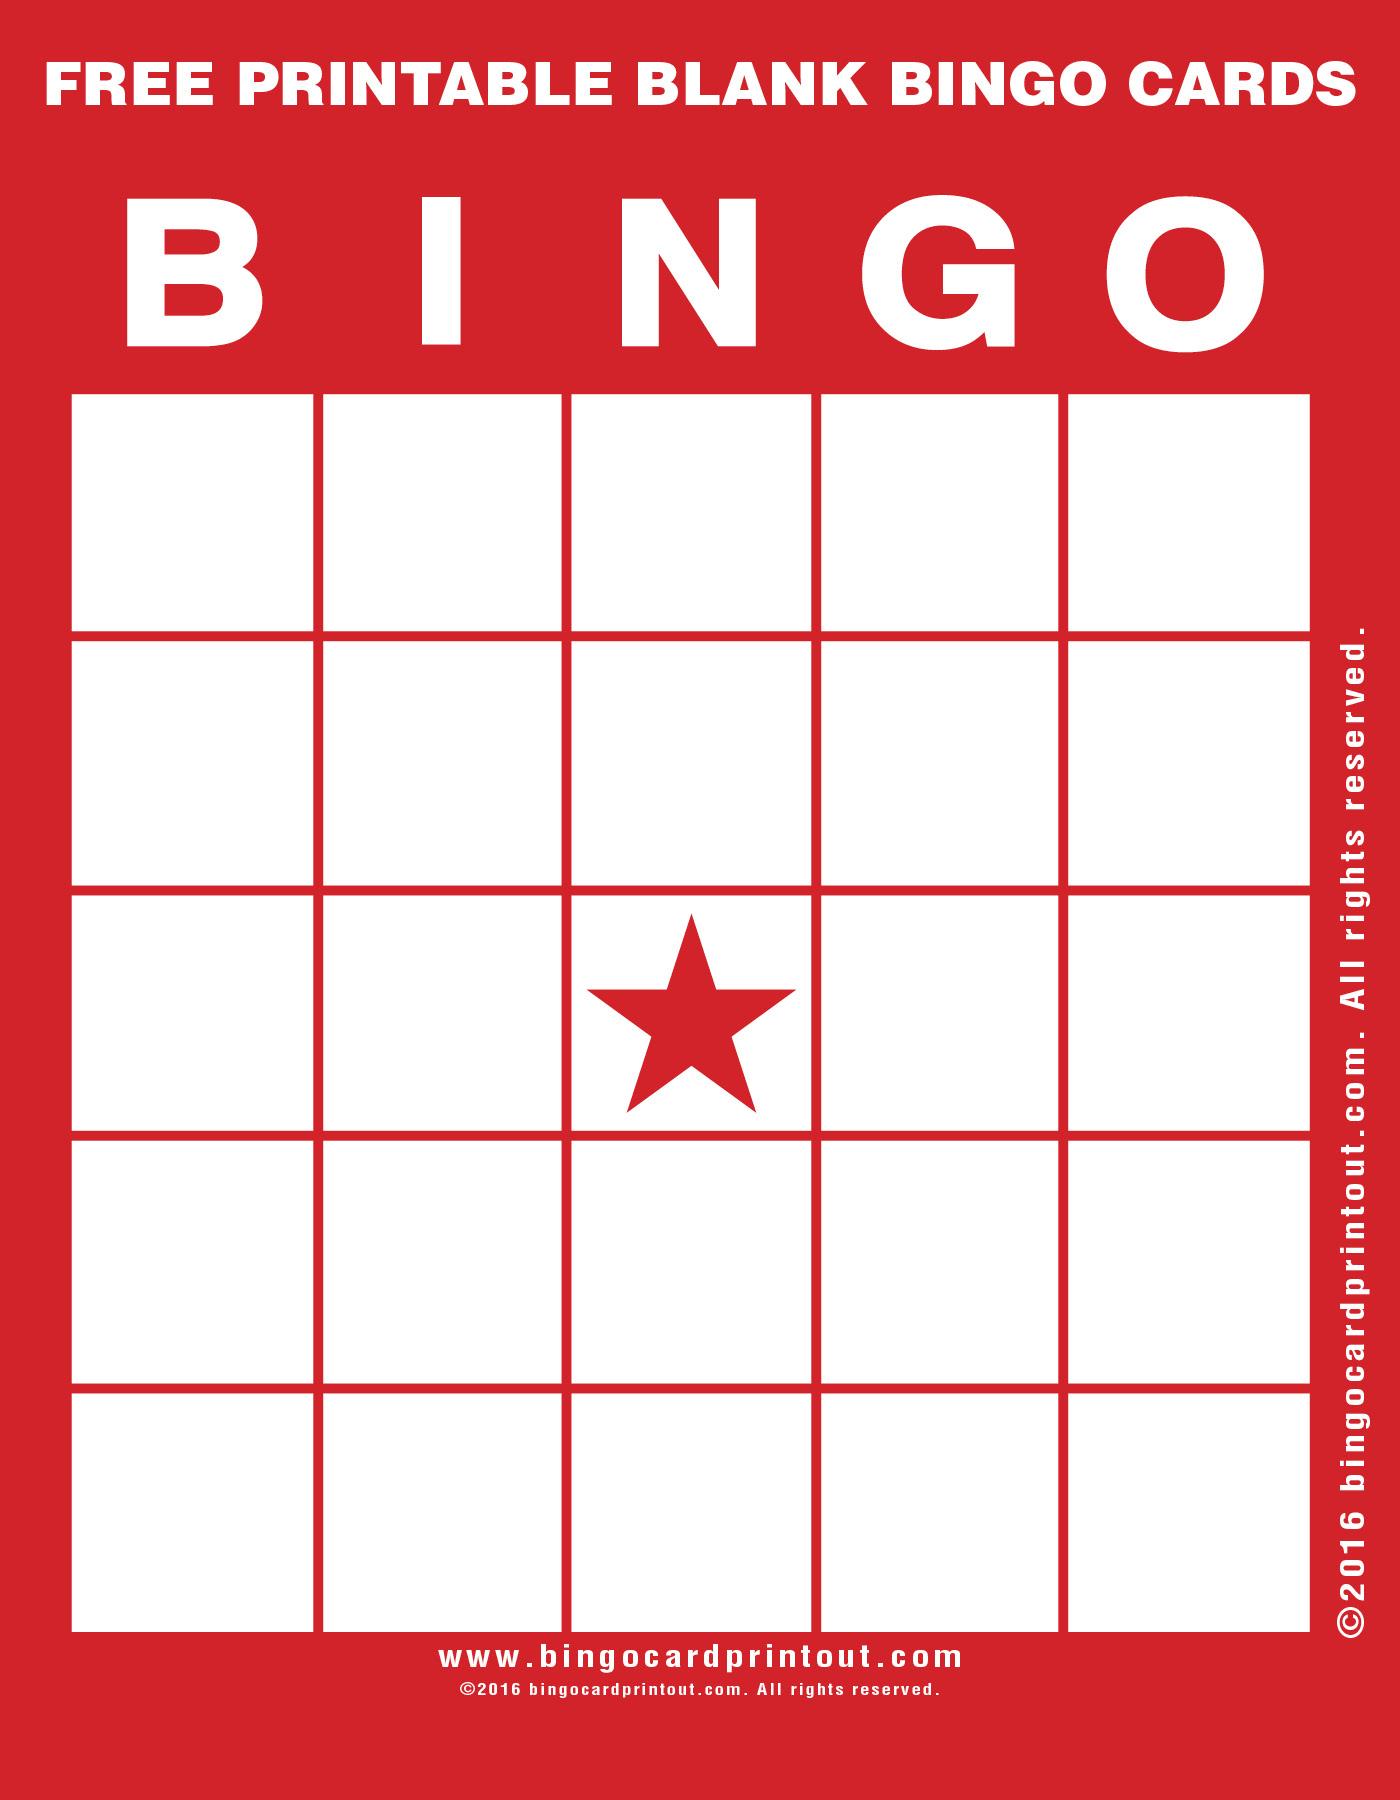 Free Printable Blank Bingo Cards - Bingocardprintout